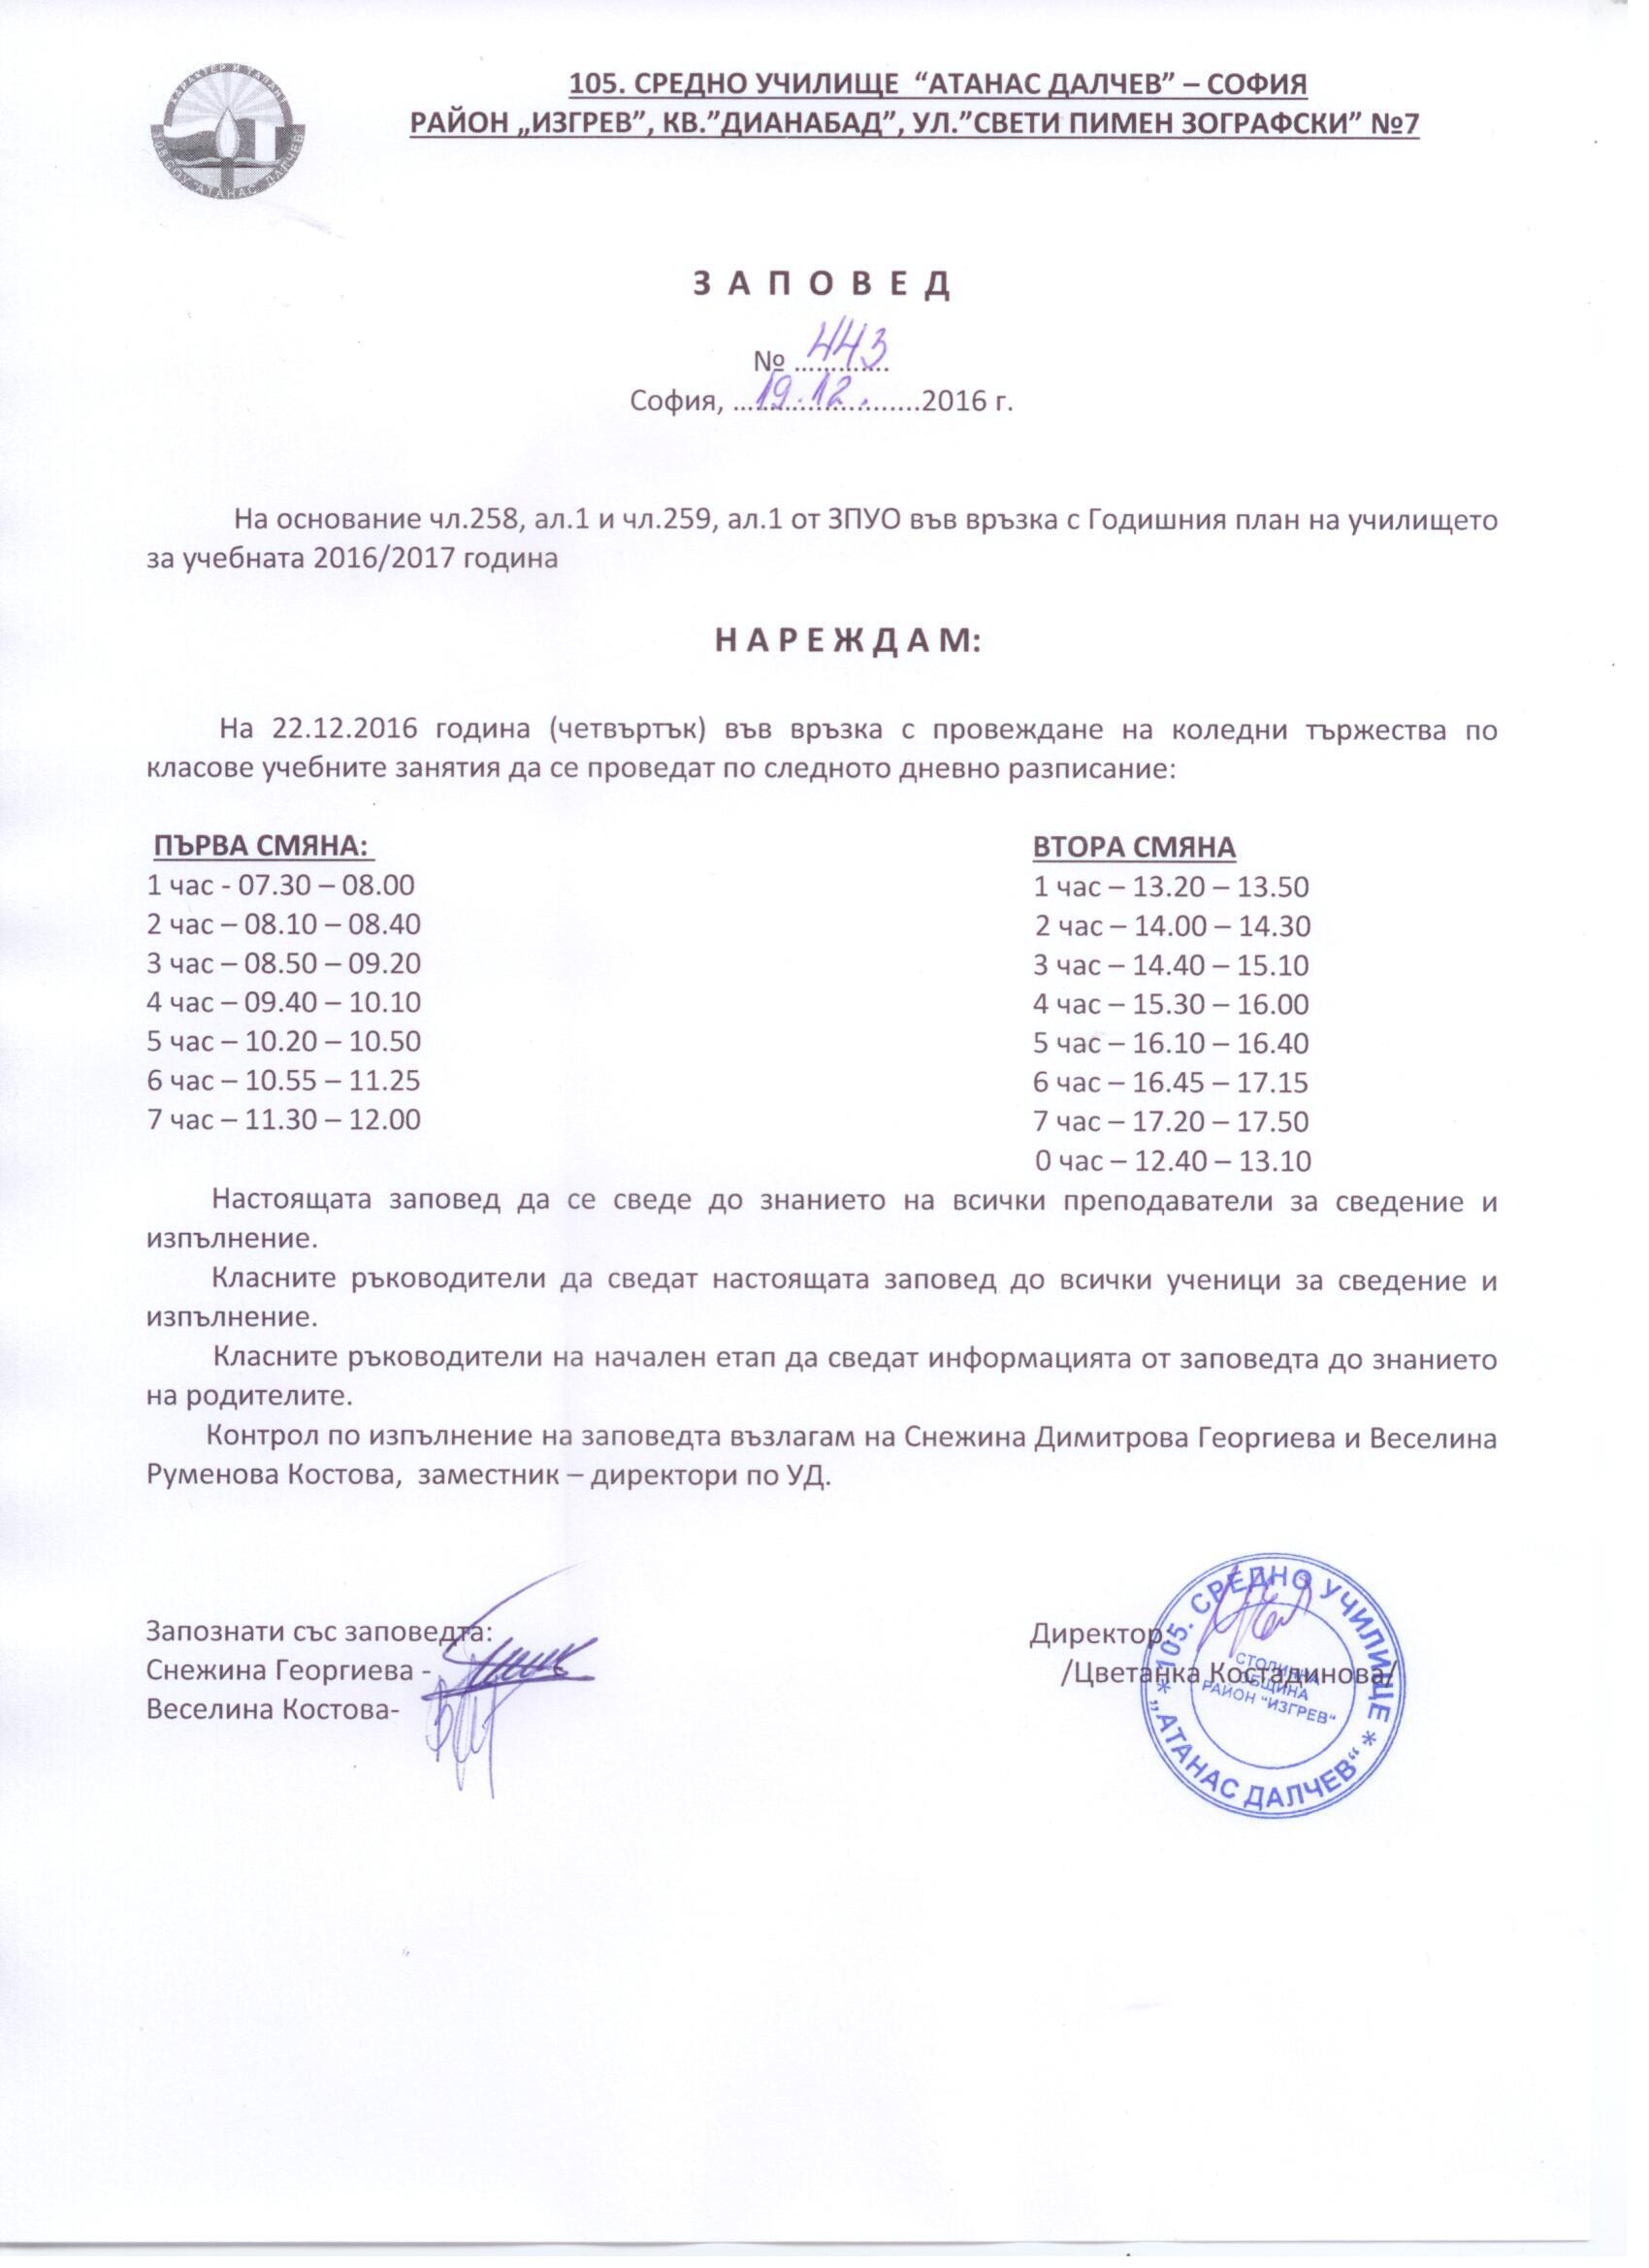 zap-001